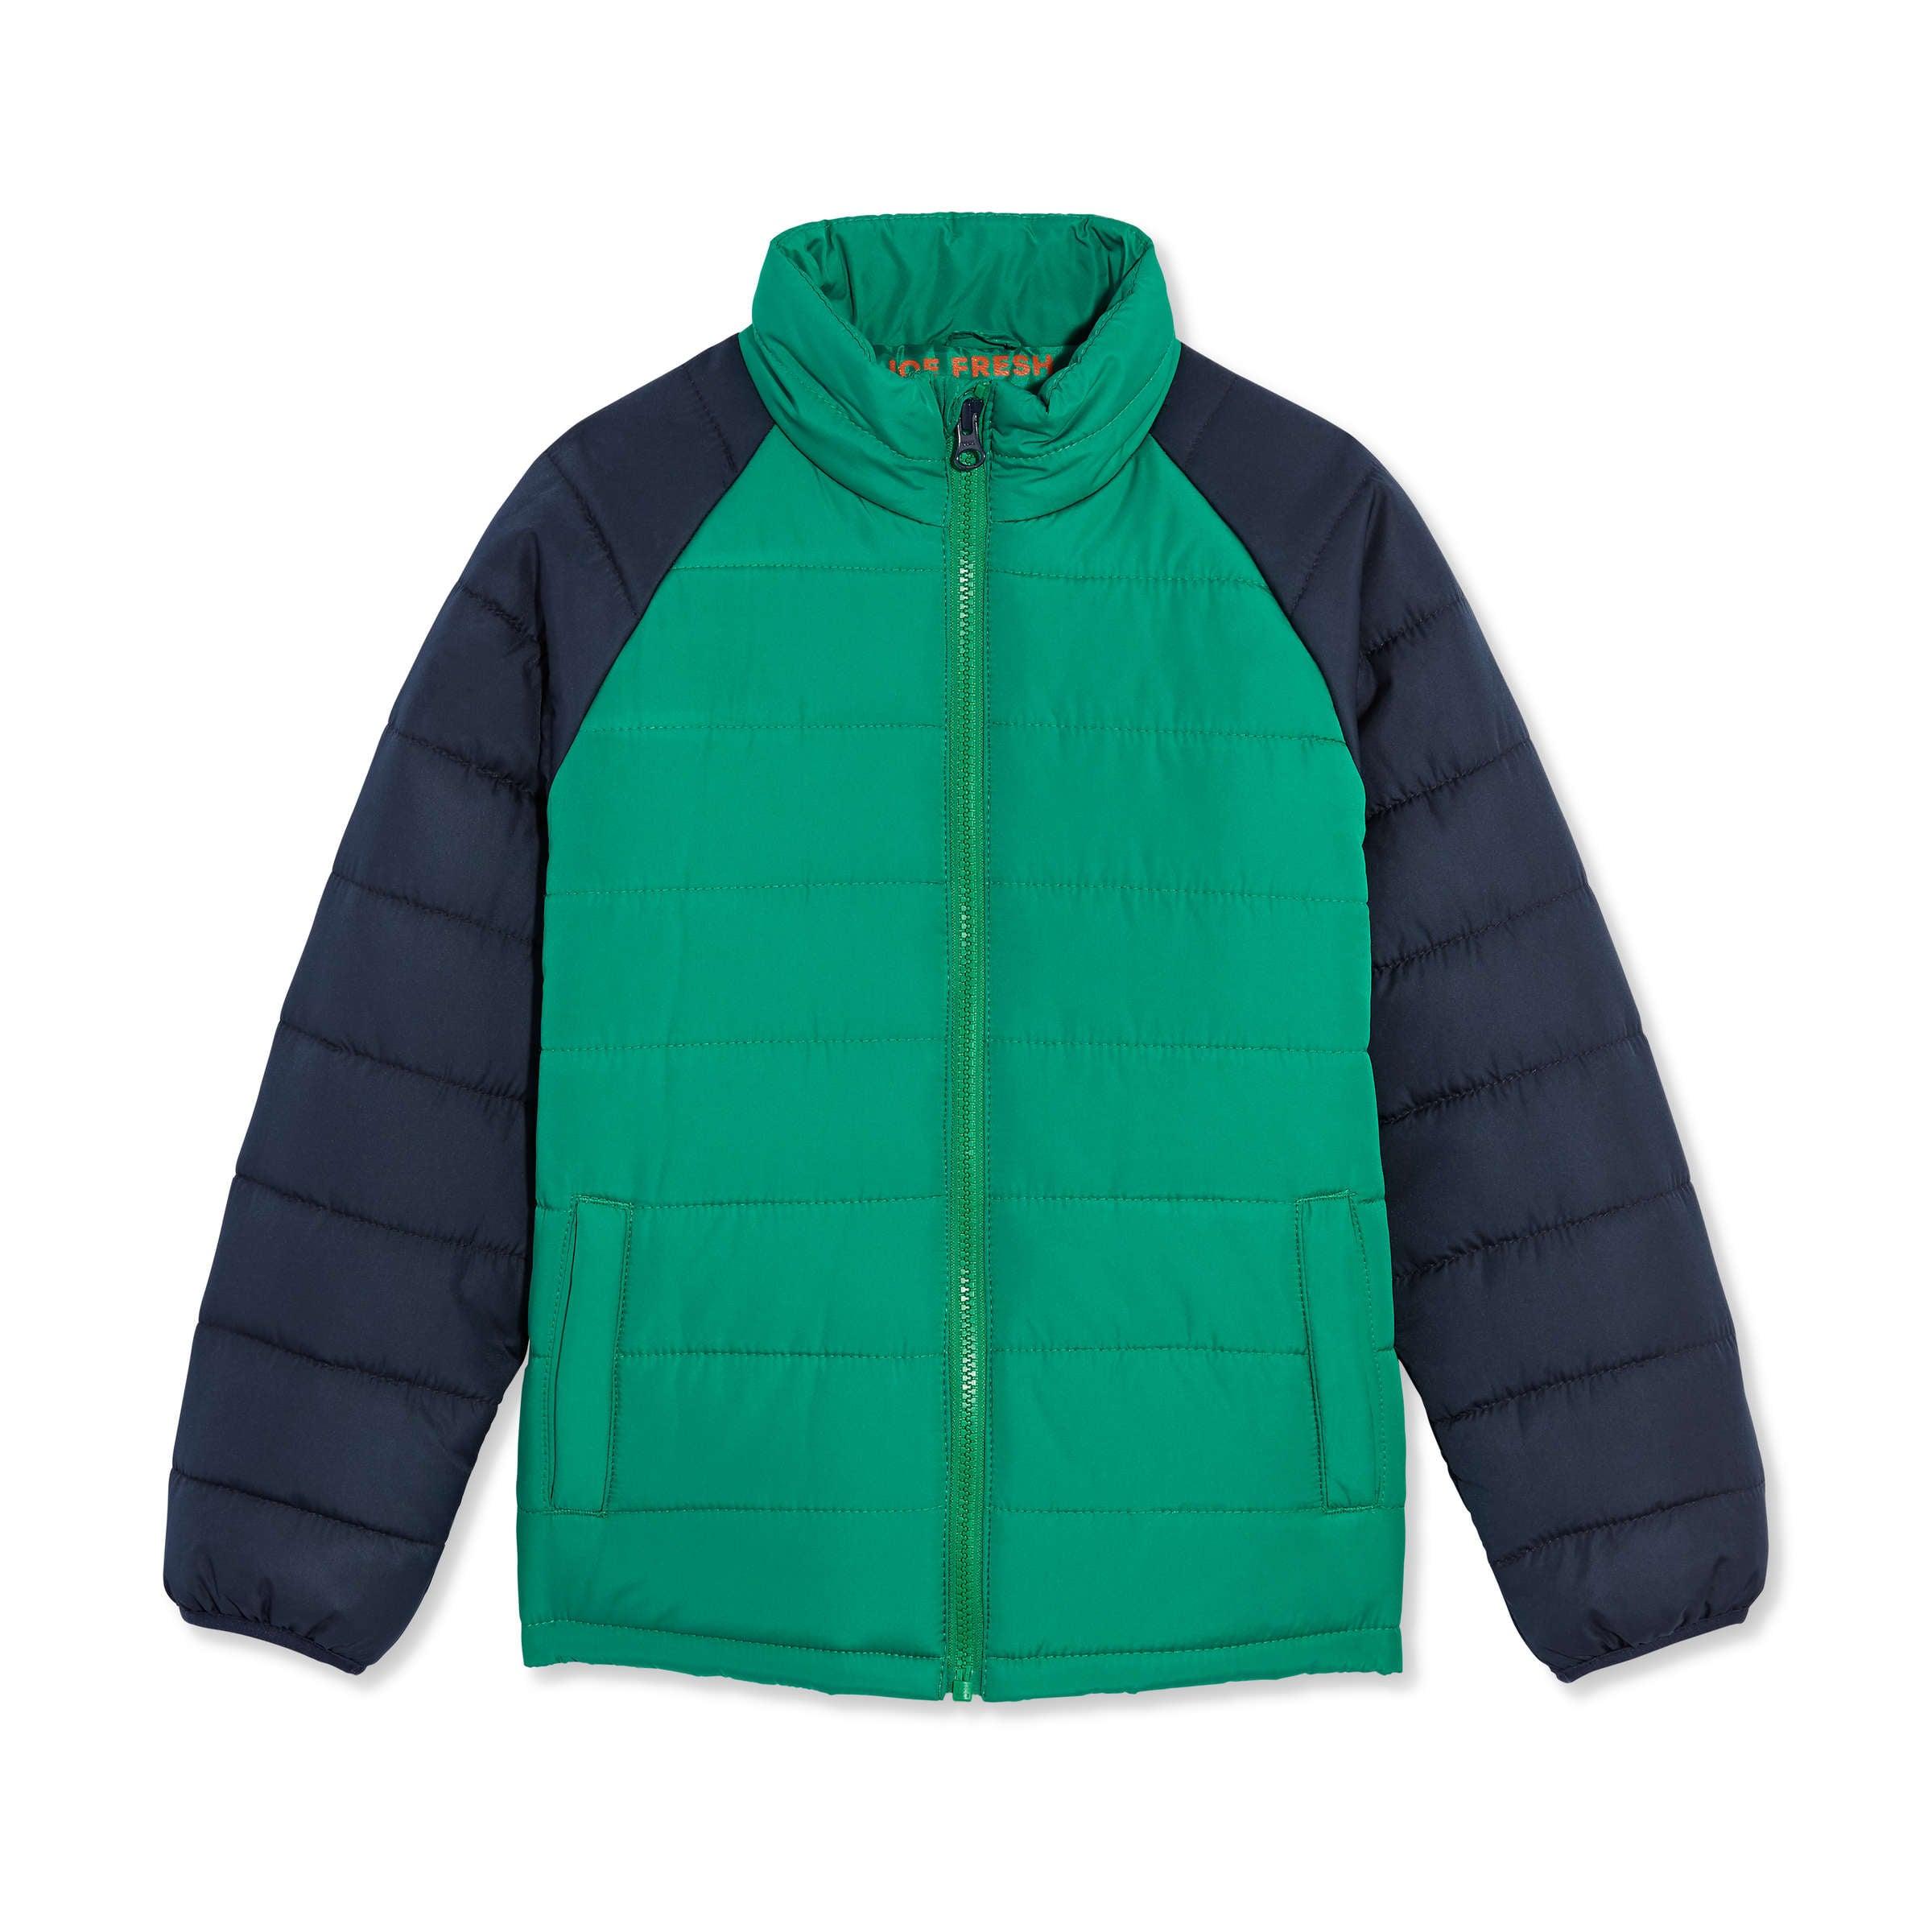 ee2833113 Kid Boys' Raglan Sleeve Puffer Jacket in Grass Green from Joe Fresh